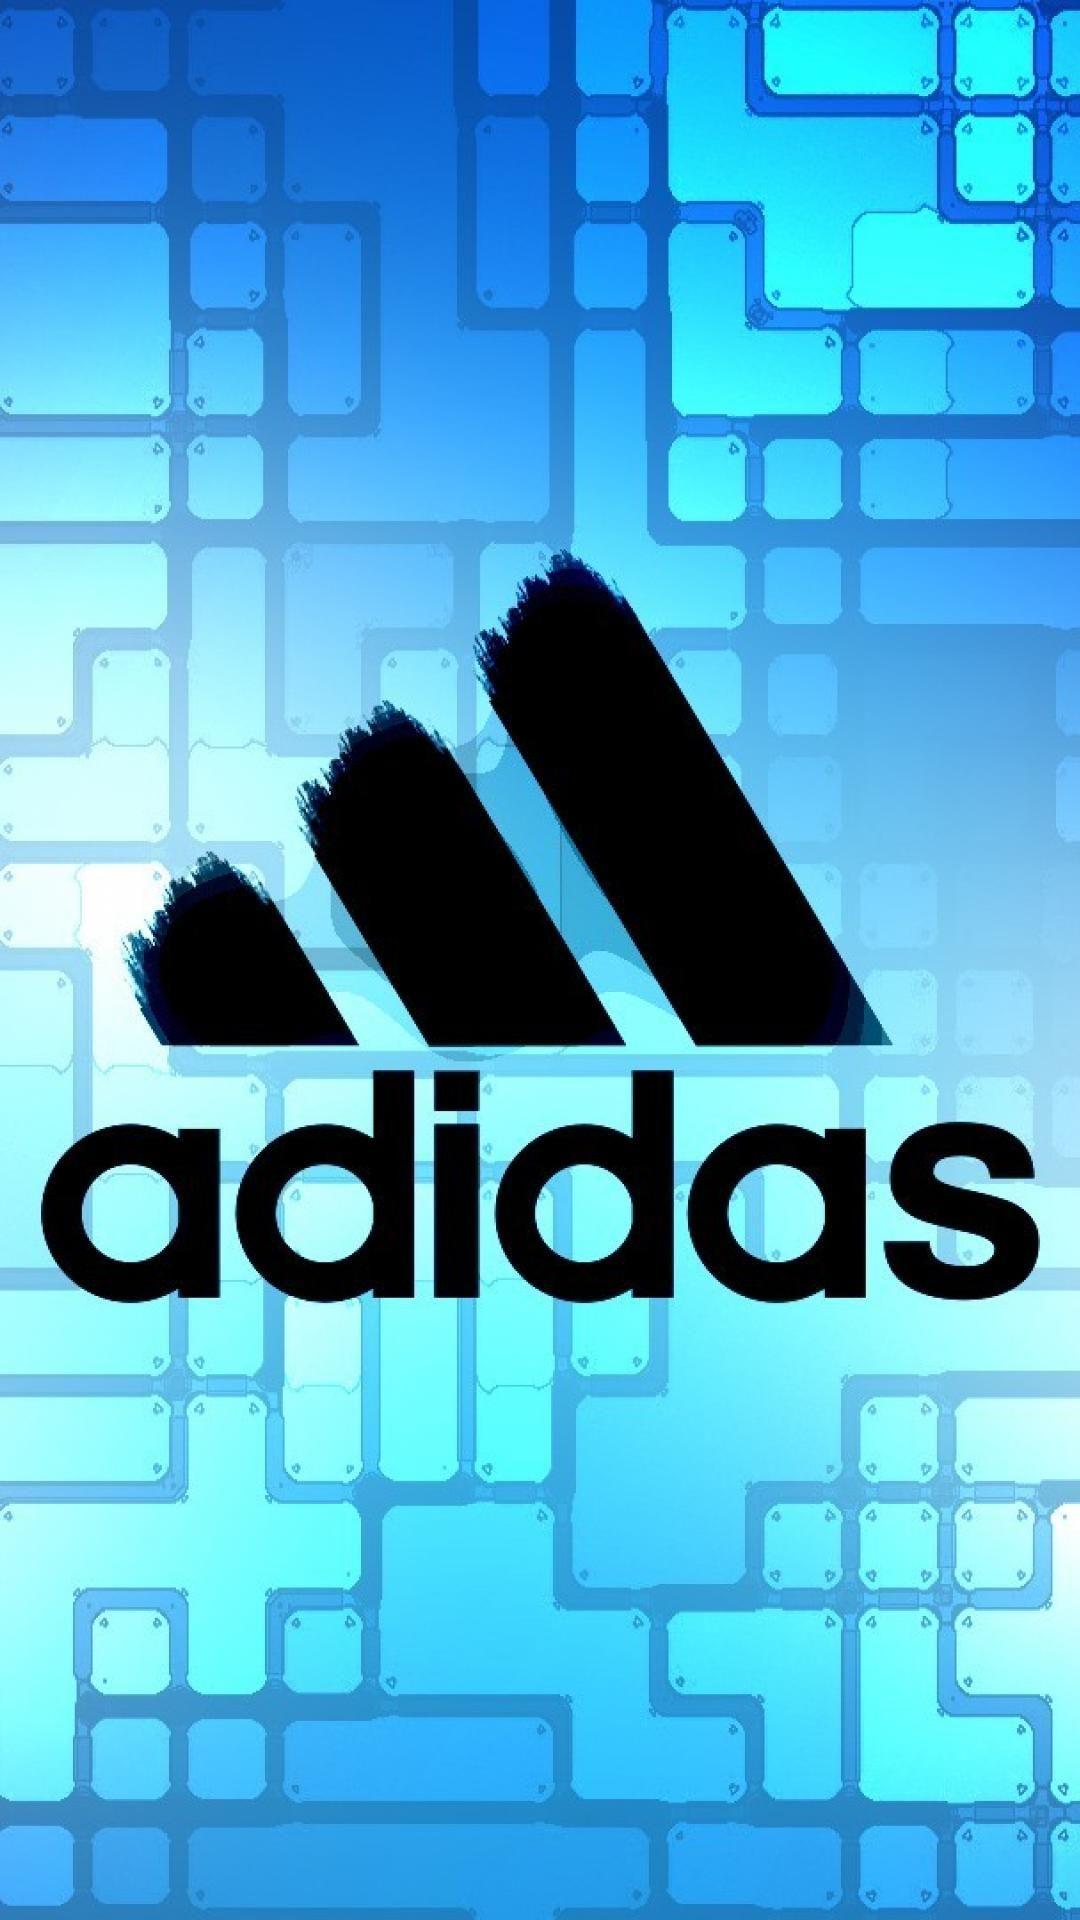 Free Download Wallpaper 3d Graphic Adidas Iphone Background Download Free Pixelstalk Net